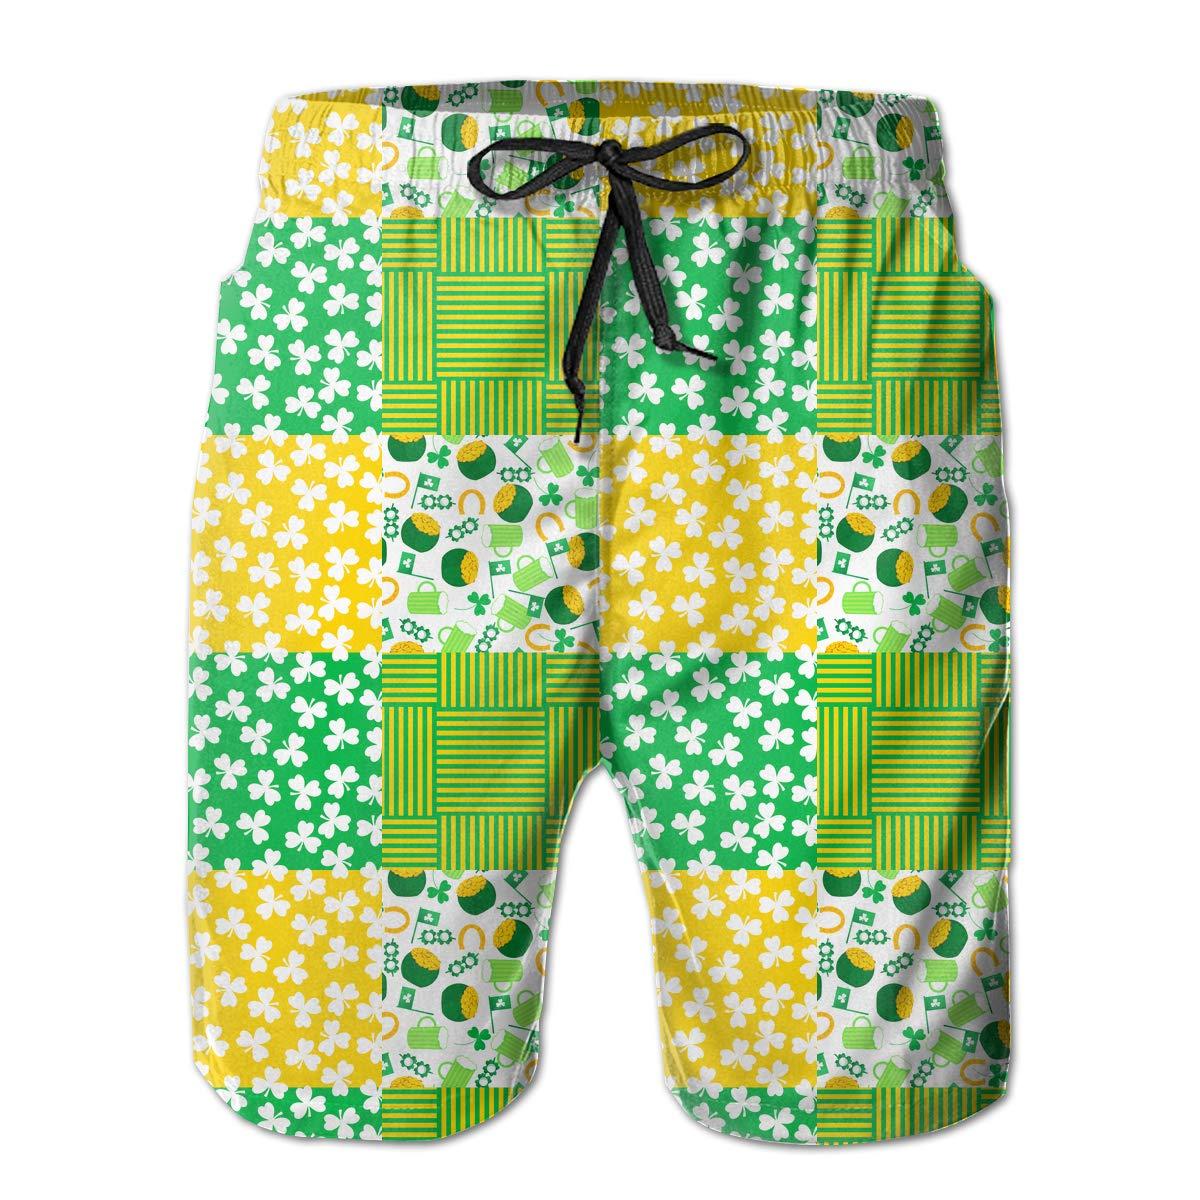 STDKNSK9 Mens St Patricks Day Irish Shamrock Pattern Board Shorts Beach Shorts